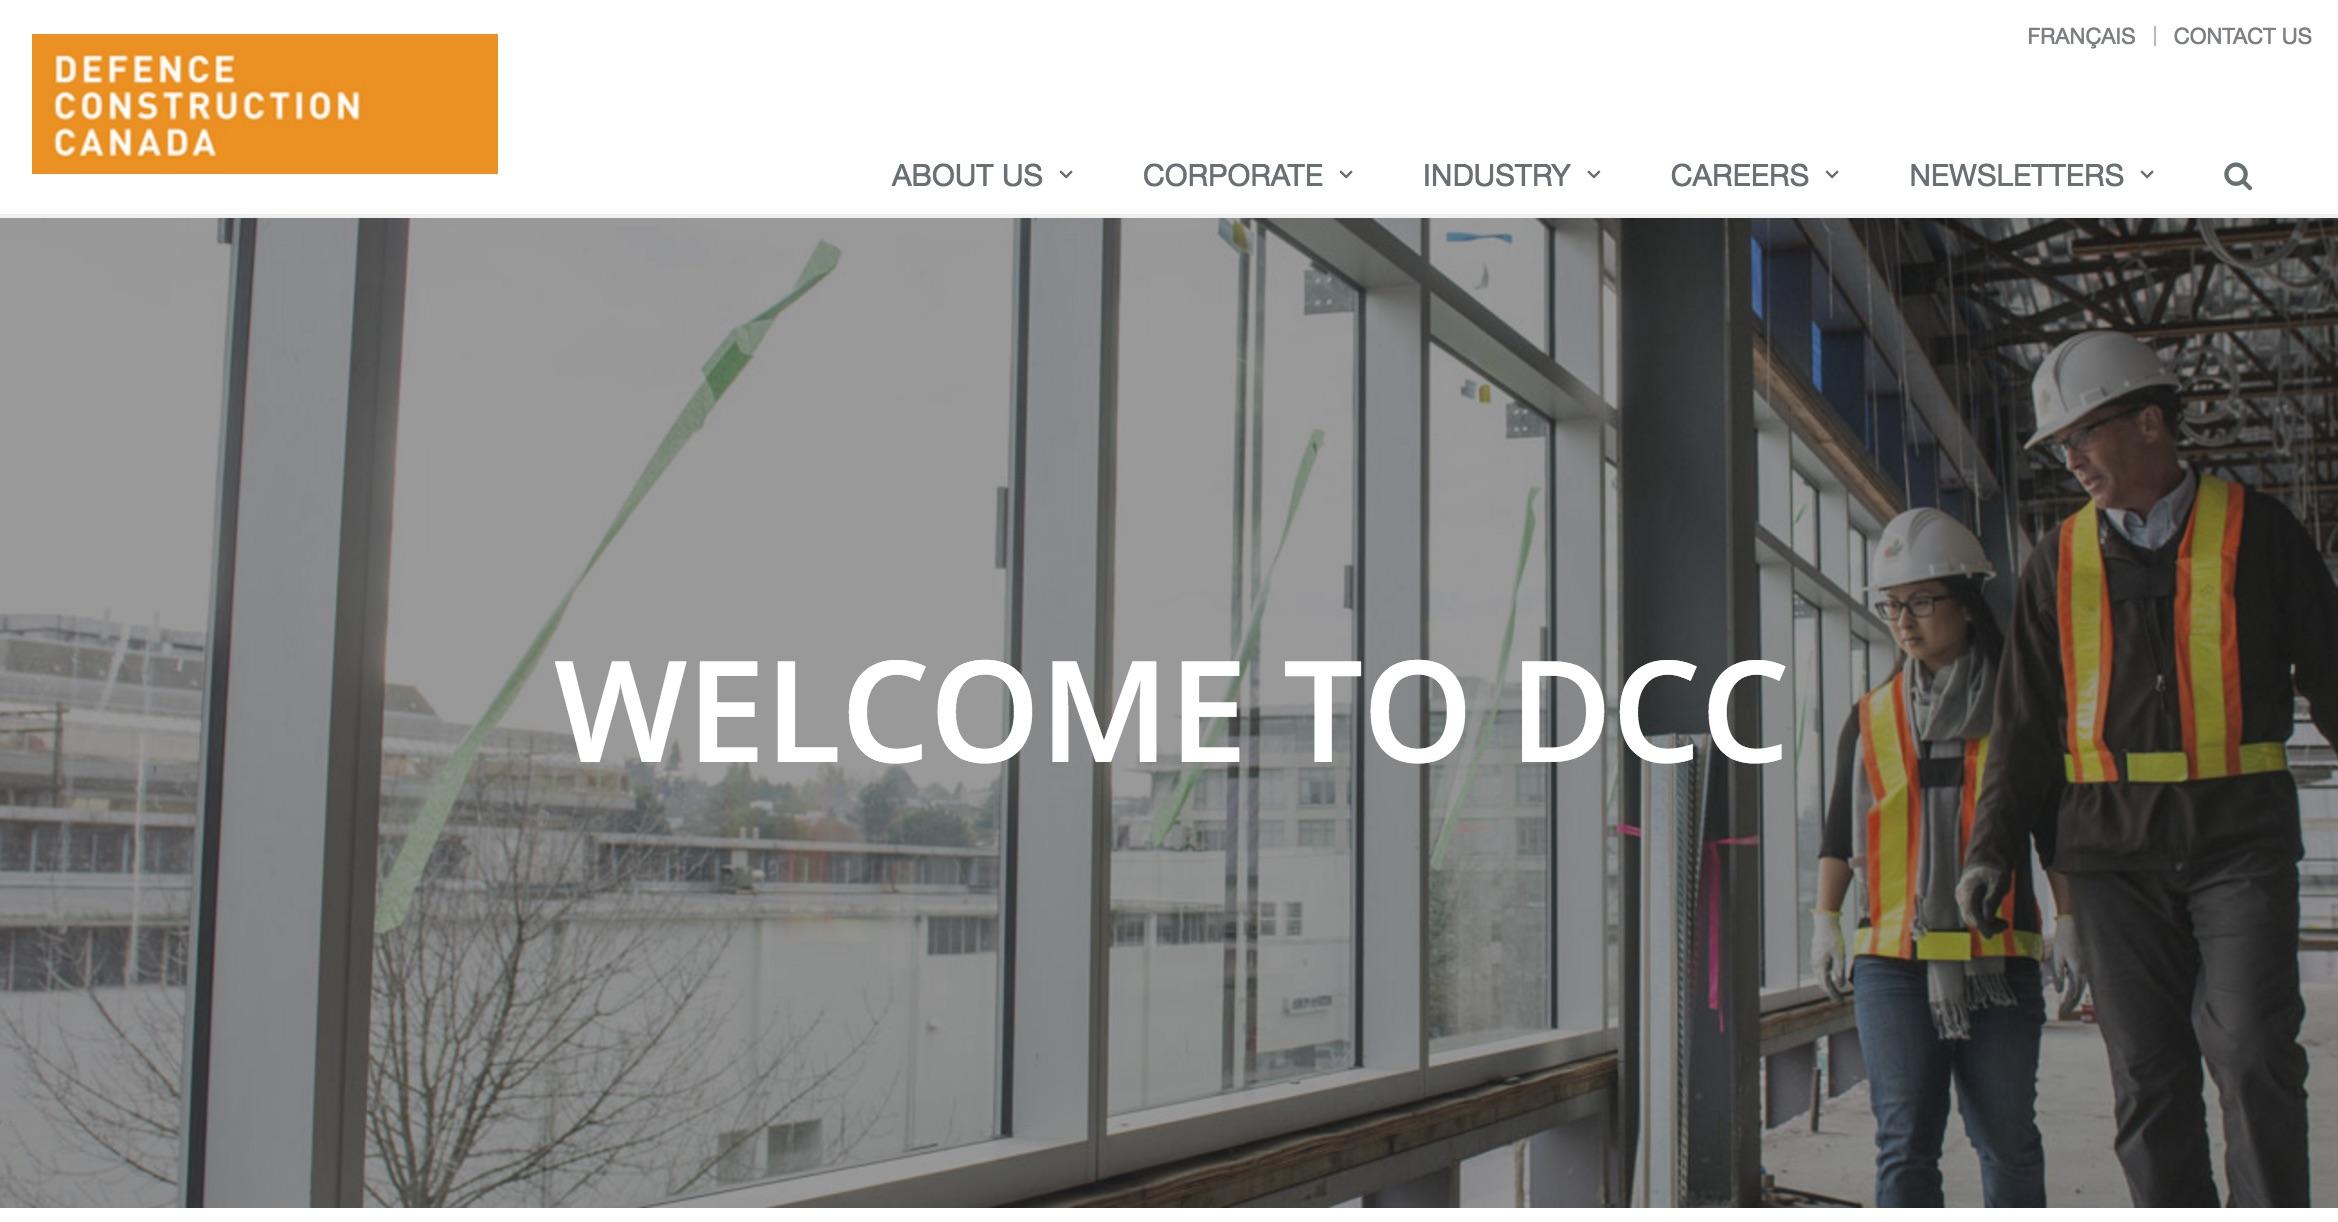 DCC webpage